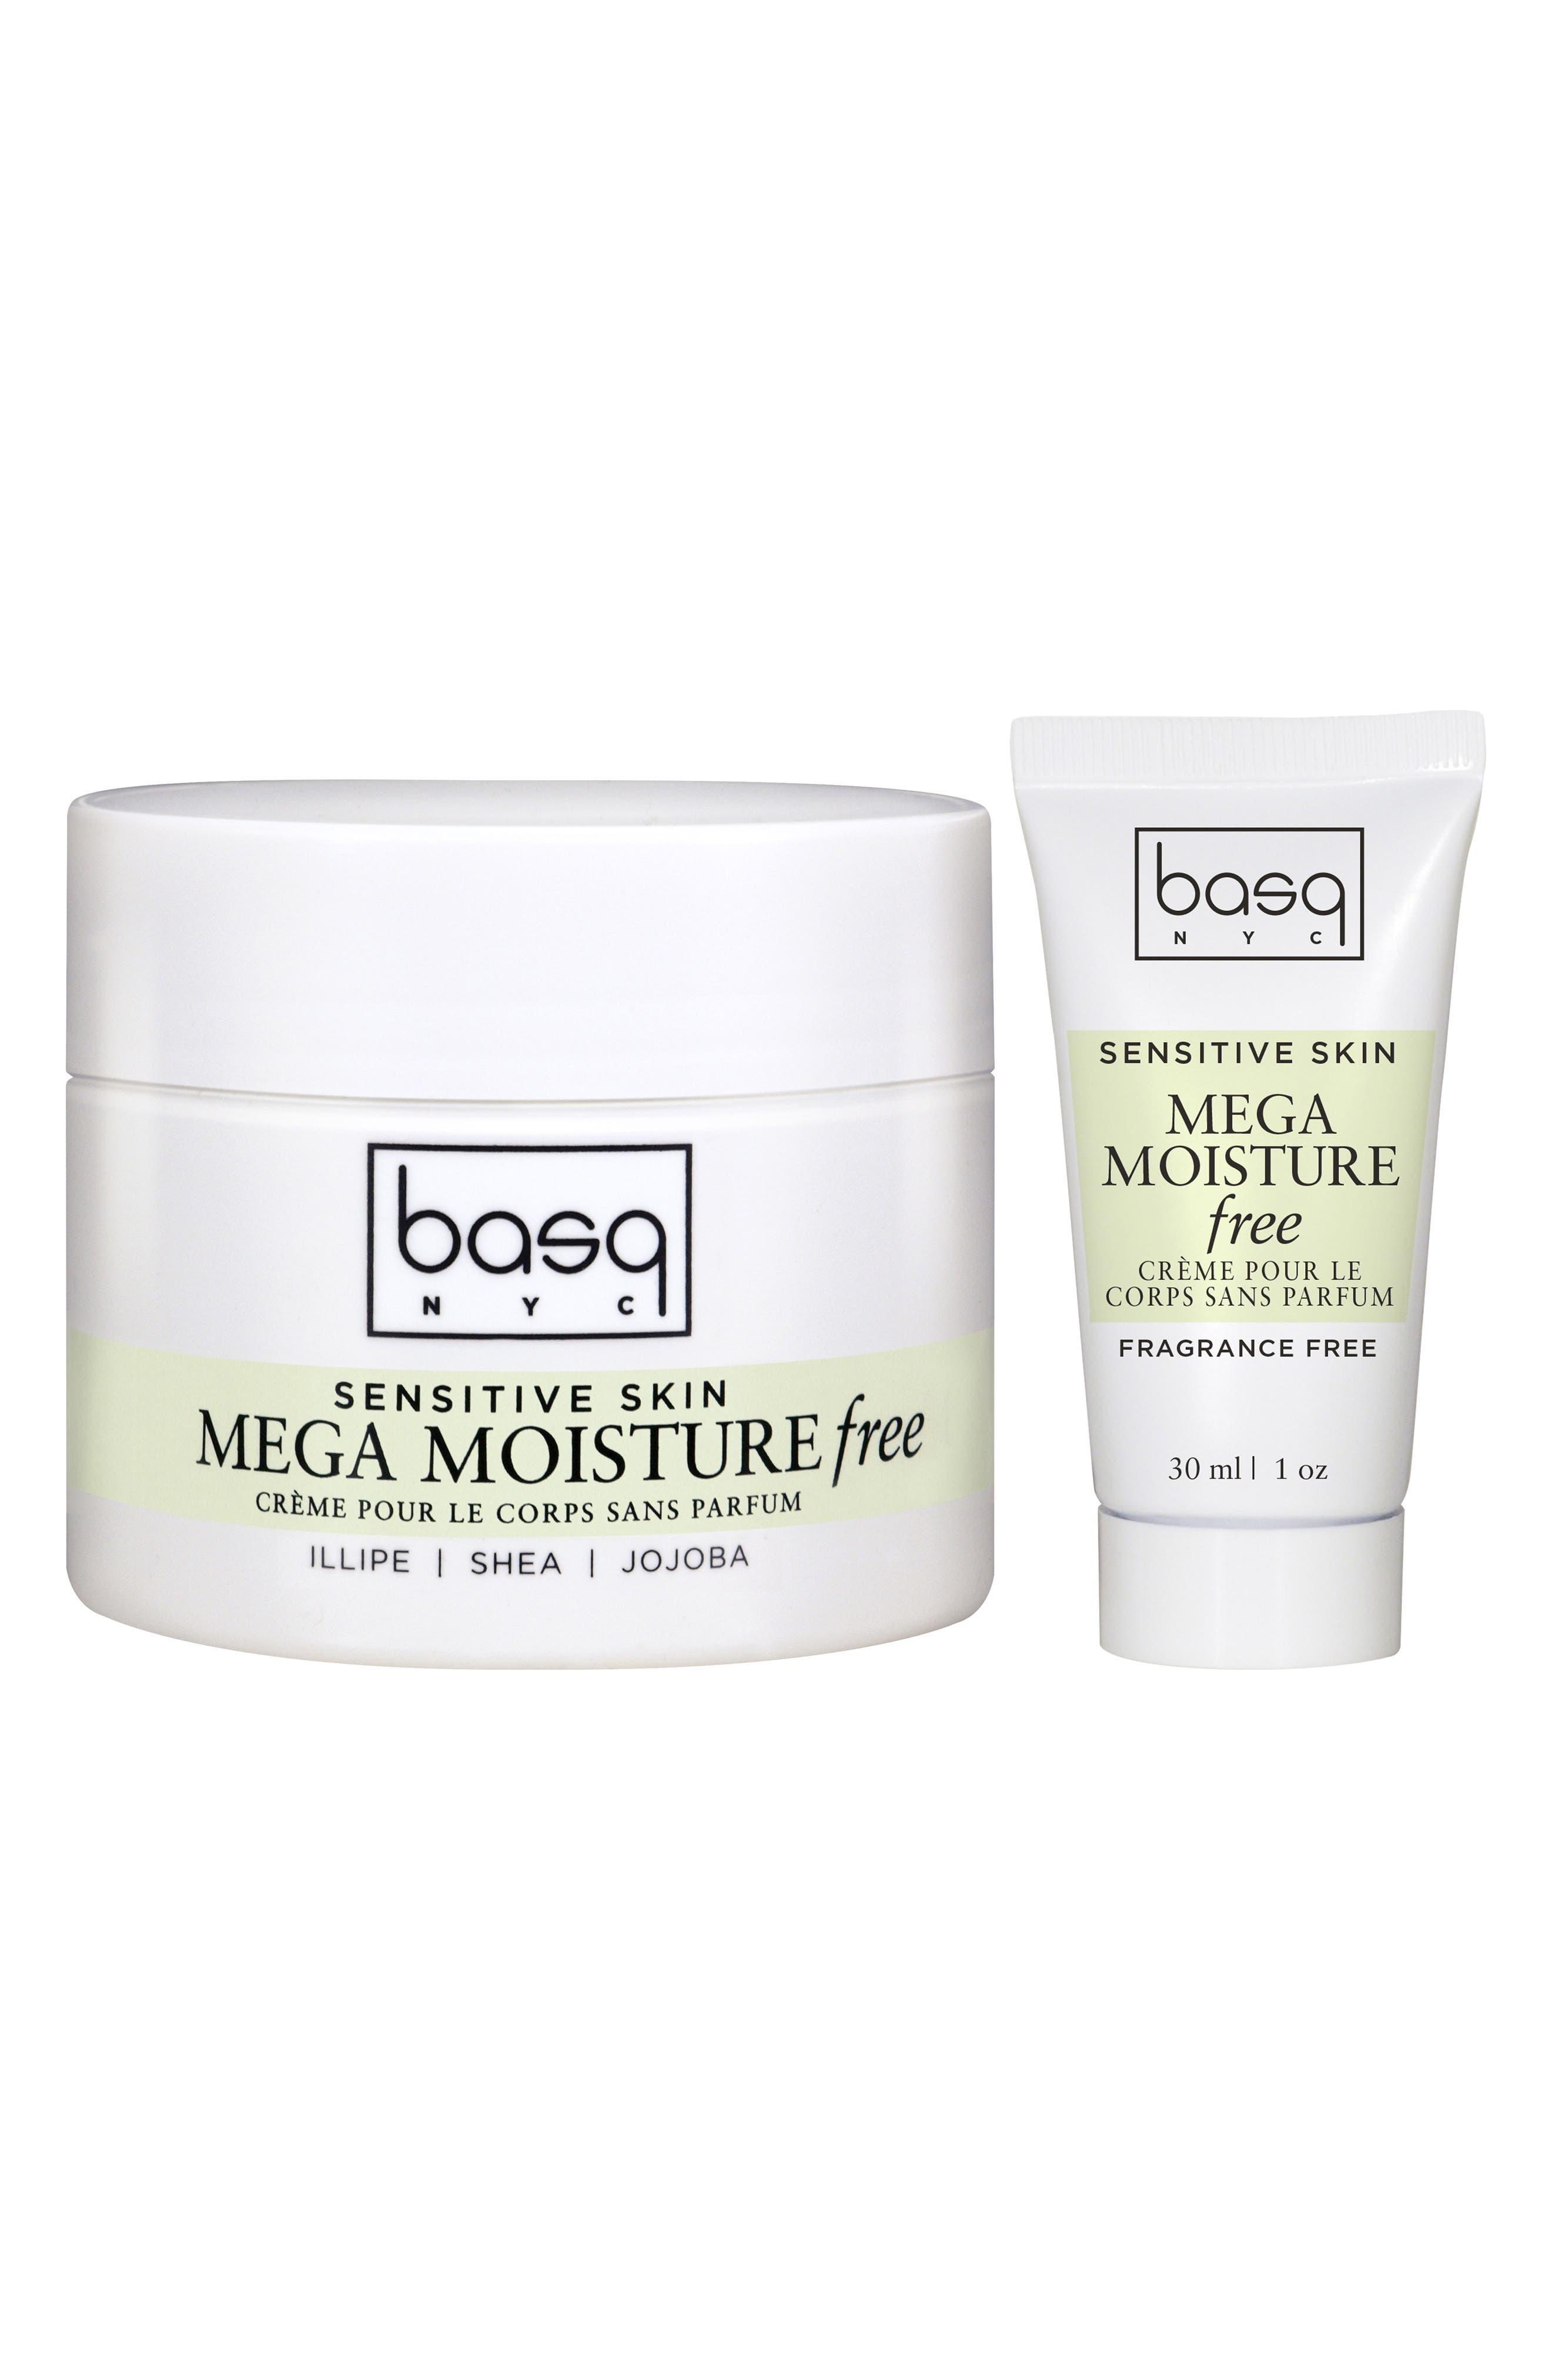 Fragrance Free Mega Moisture Cream Duo,                             Main thumbnail 1, color,                             White